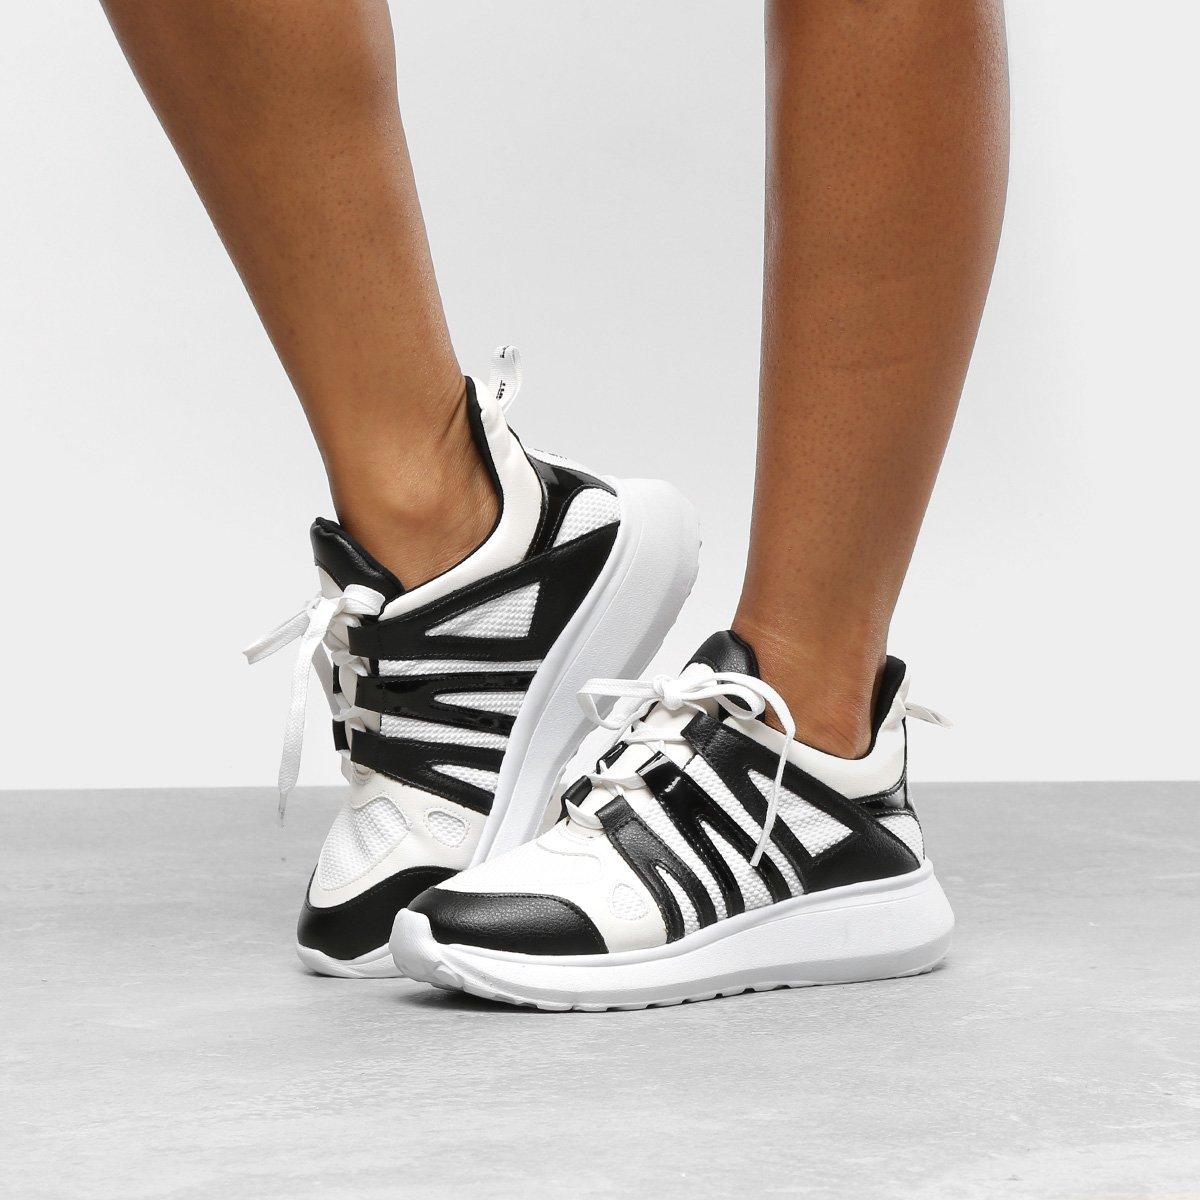 Dad sneakers feminino 2020